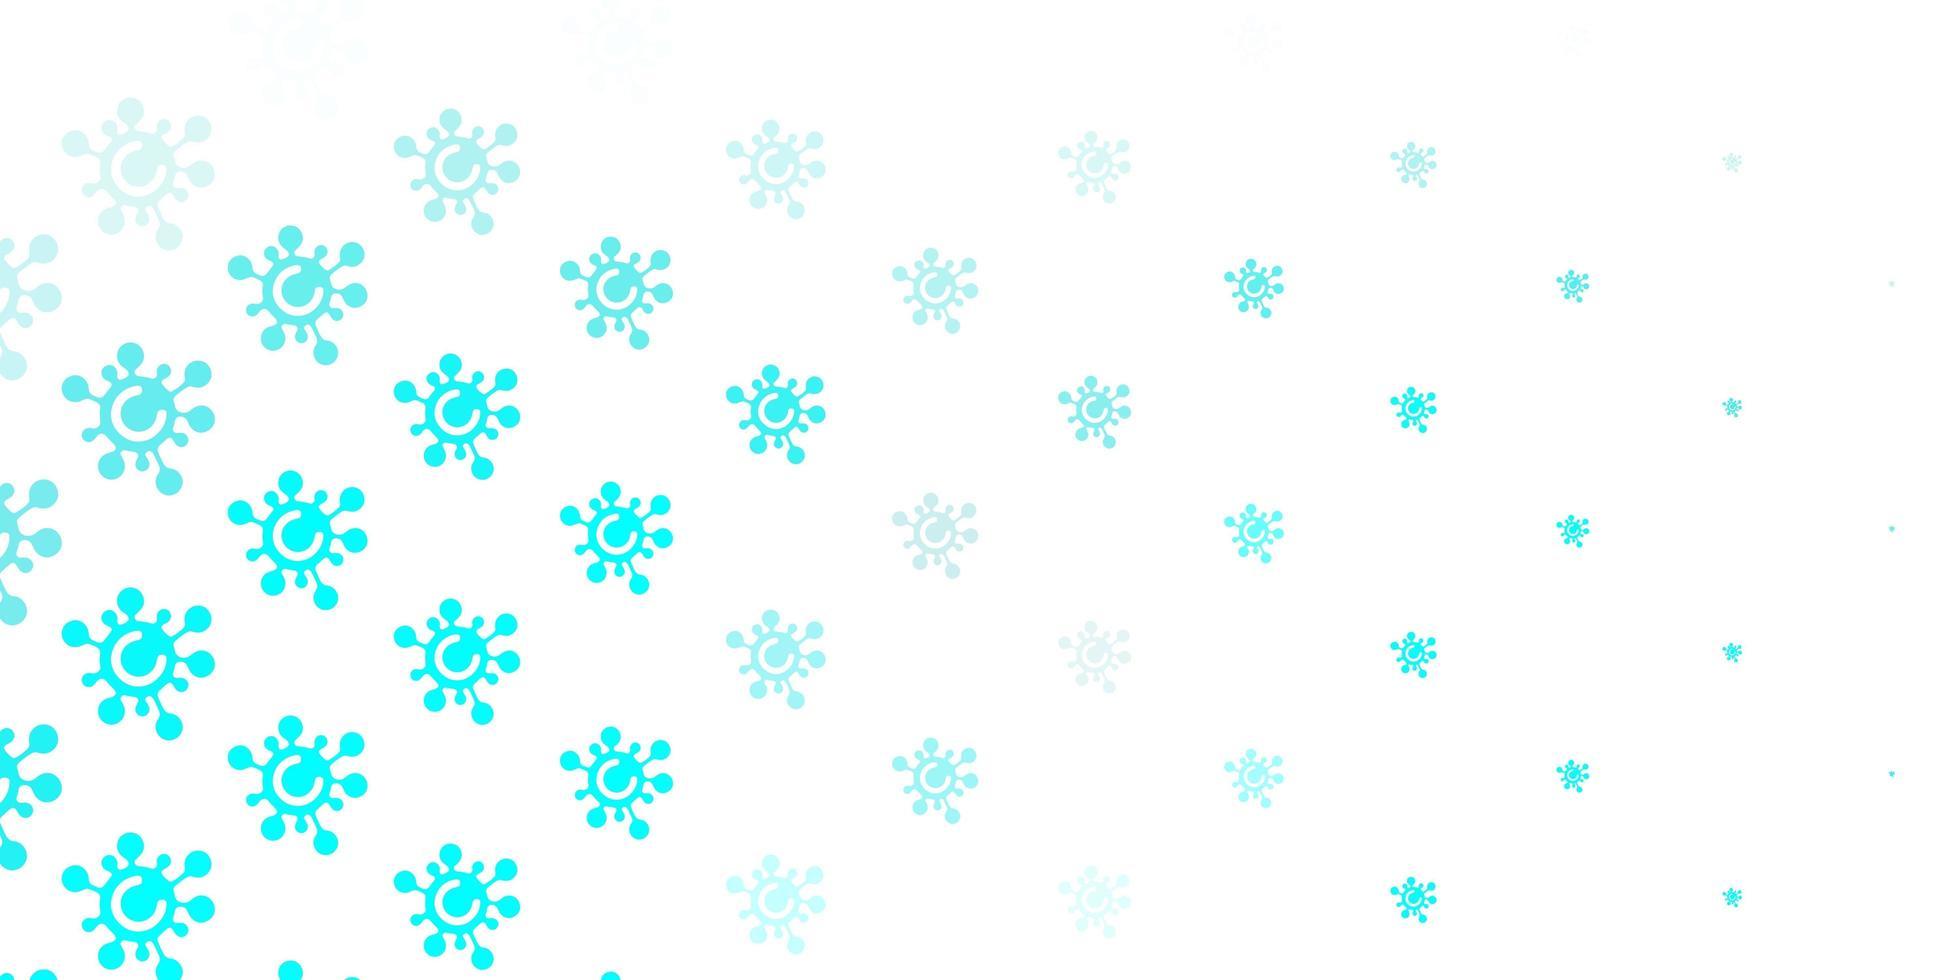 hellgrüner Vektorhintergrund mit covid-19 Symbolen. vektor